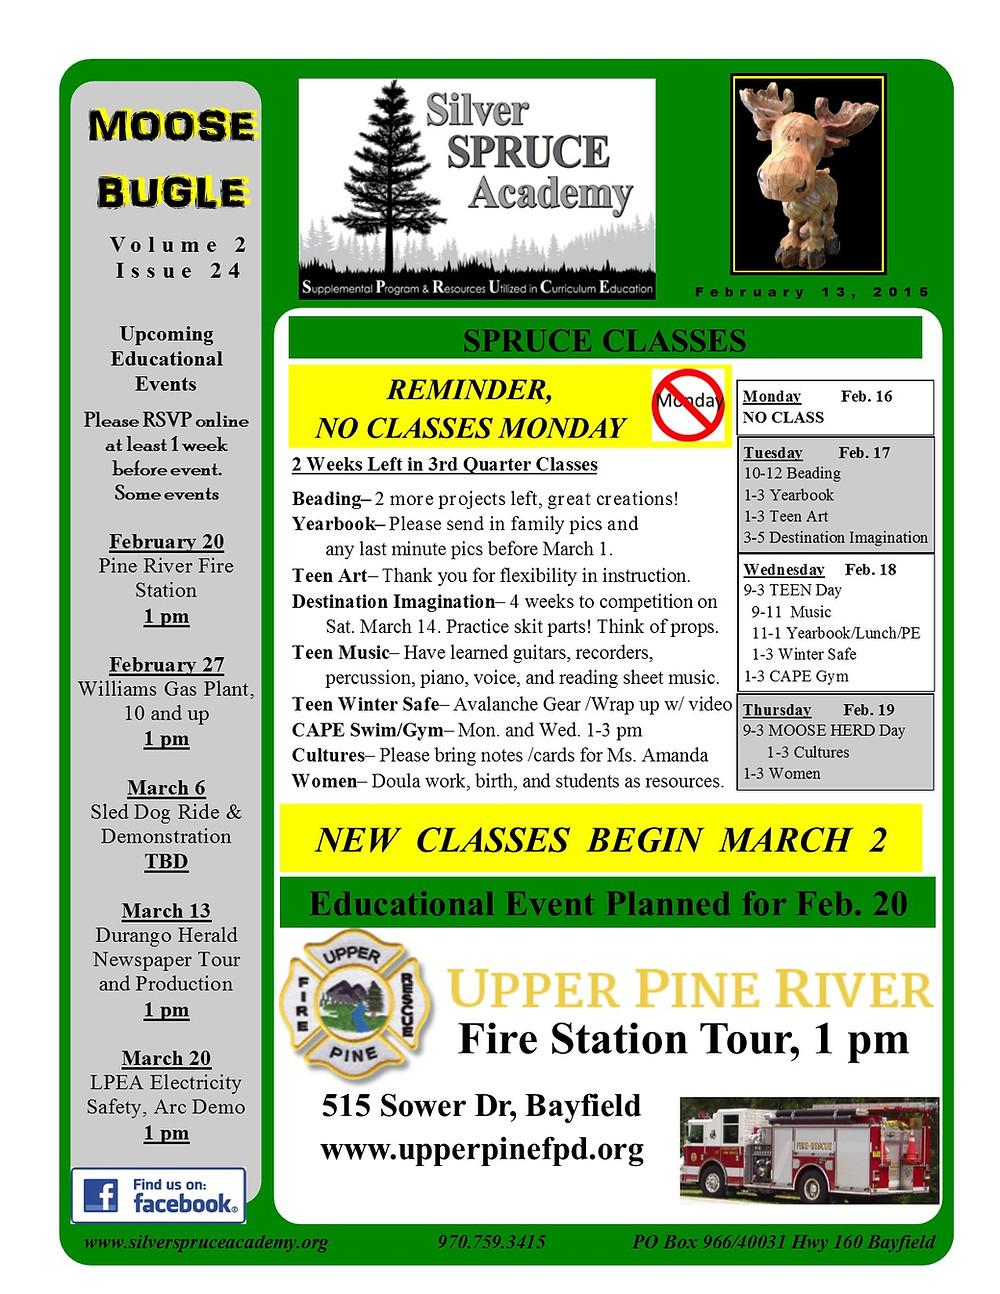 Moose Bugle 2-13-15 (Page 1).jpg